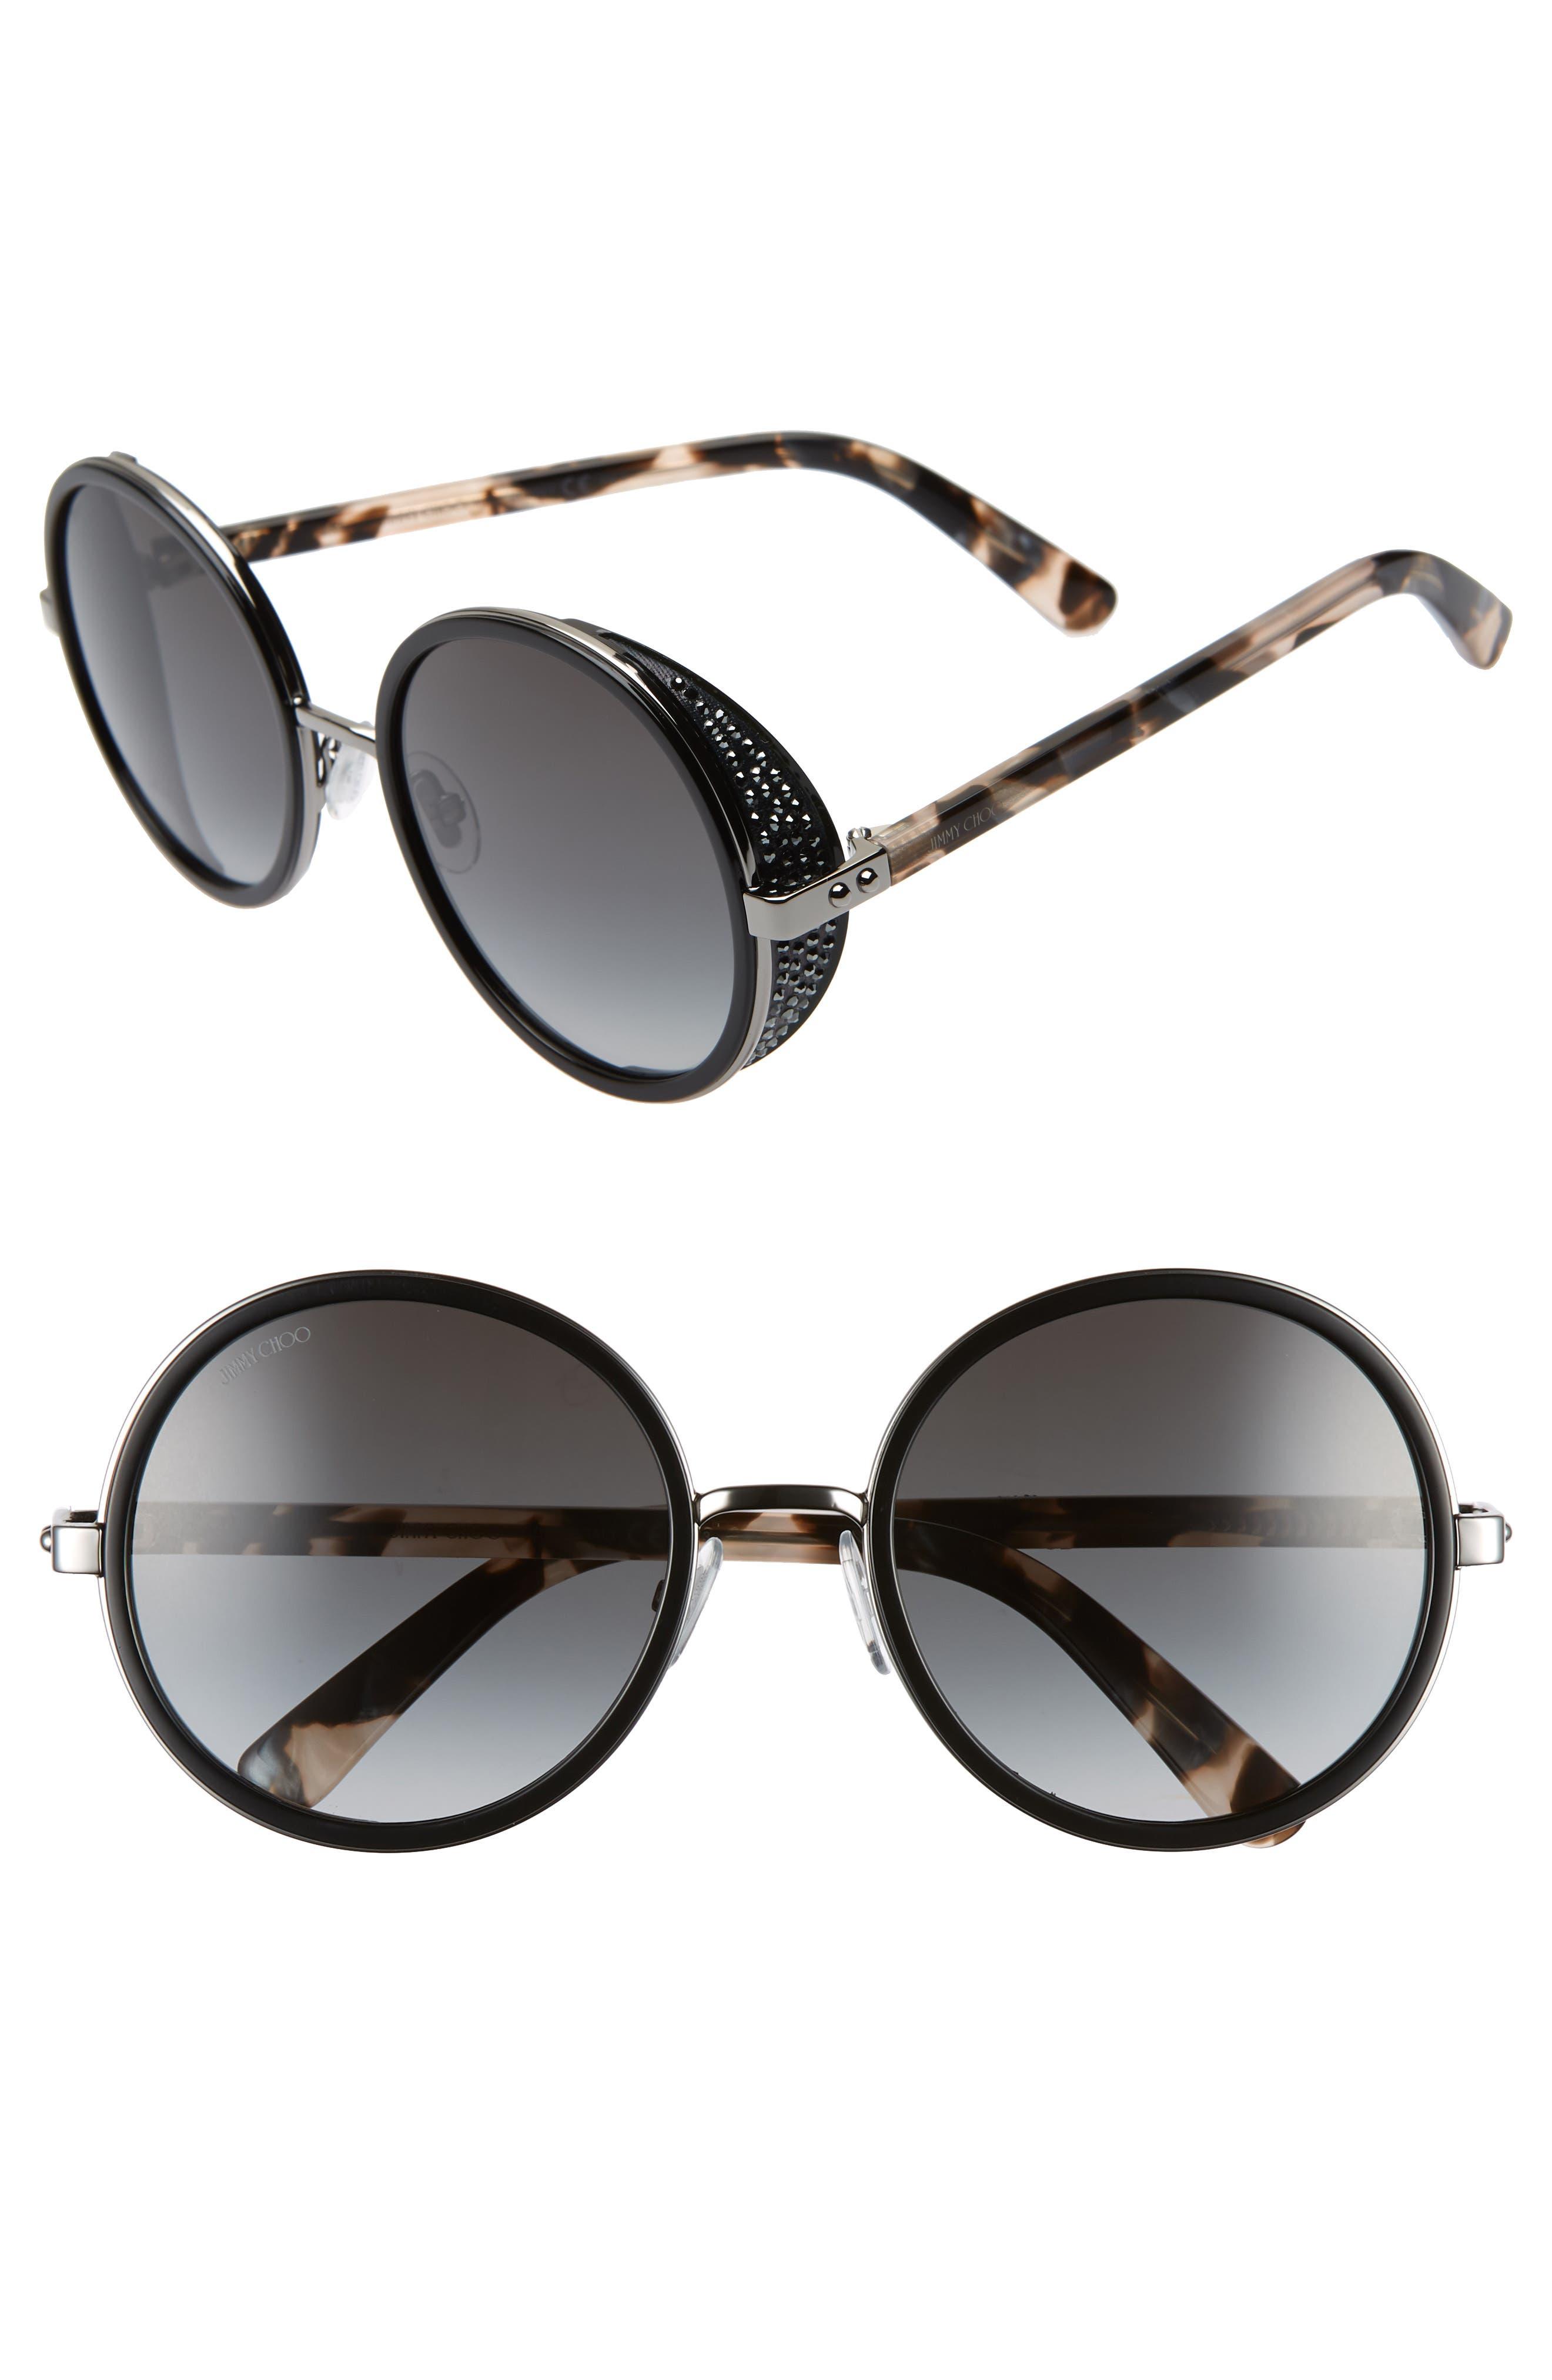 Andiens 54mm Round Sunglasses,                             Main thumbnail 1, color,                             BLACK